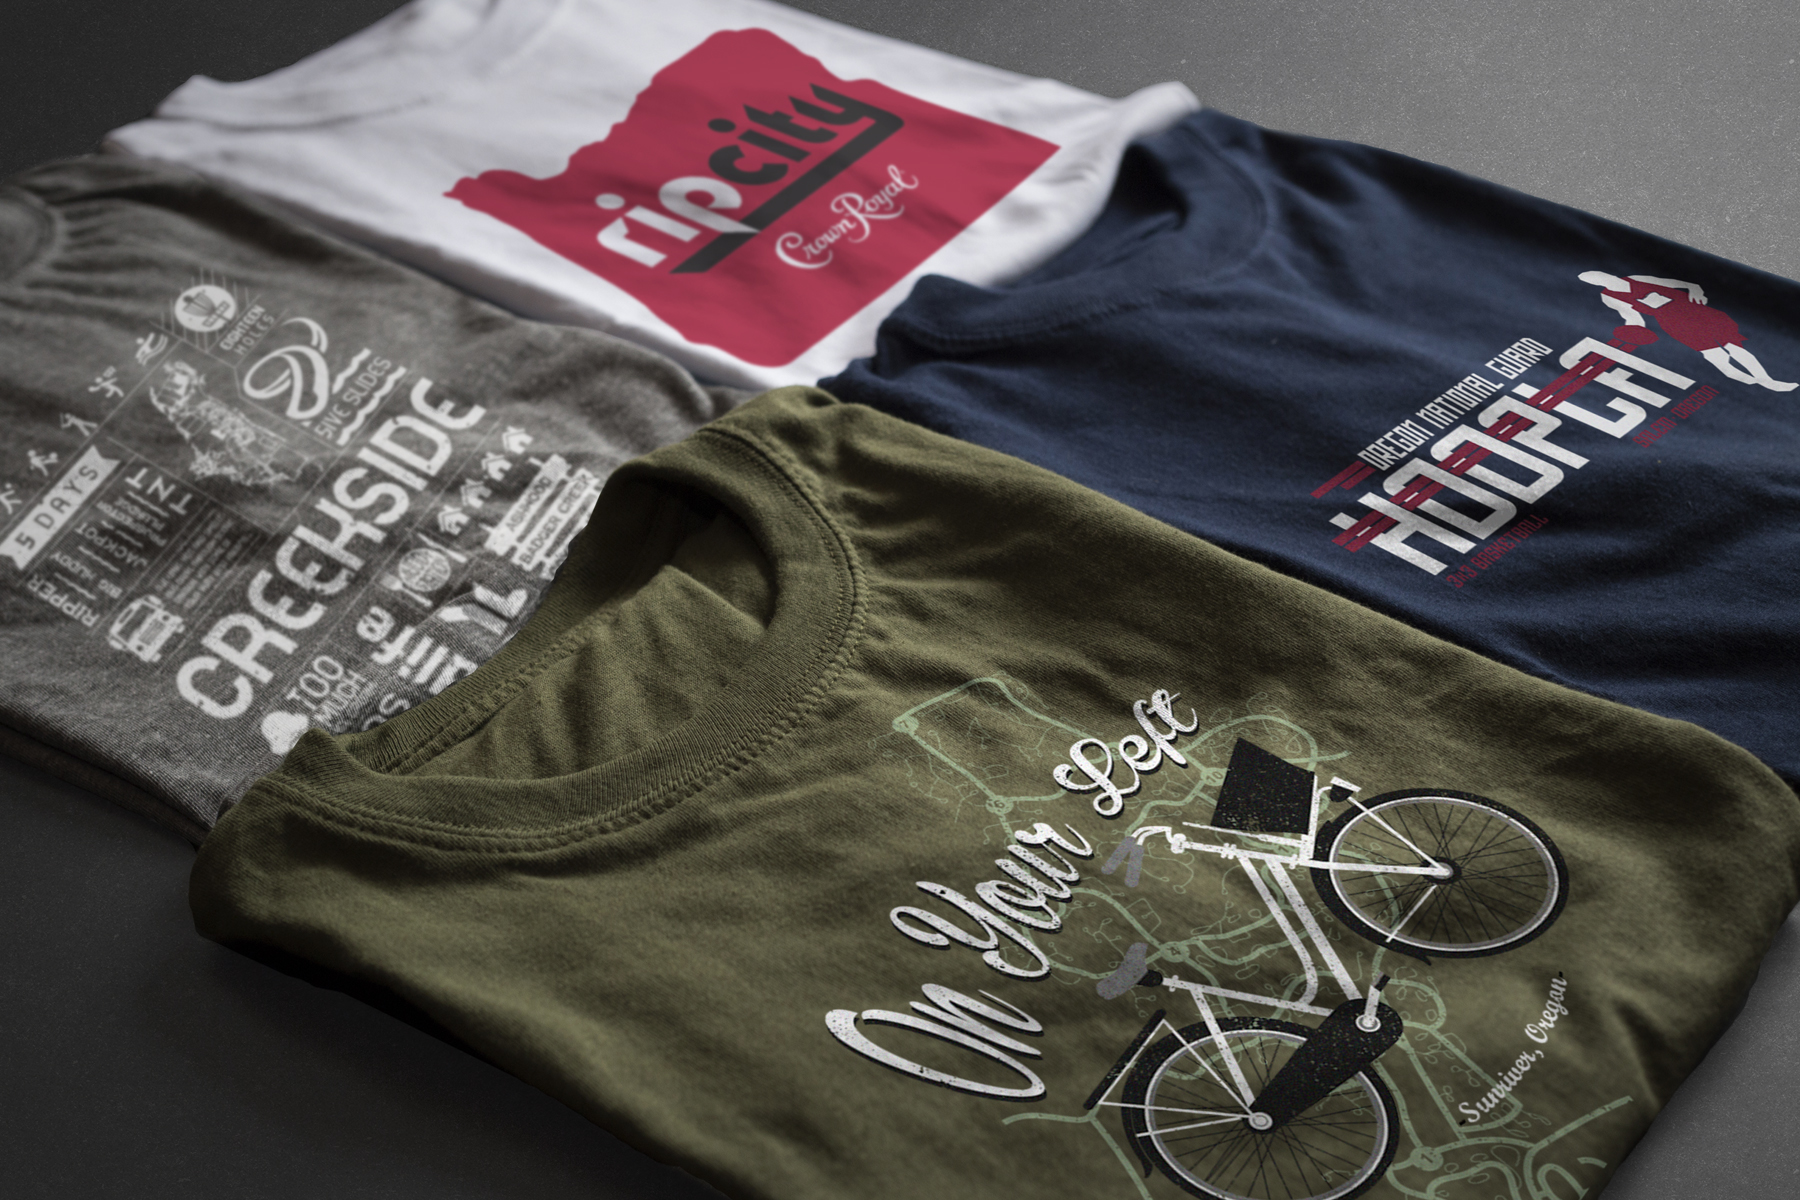 Wears My Shirt Custom Garments Tees - Soft Goods.jpg